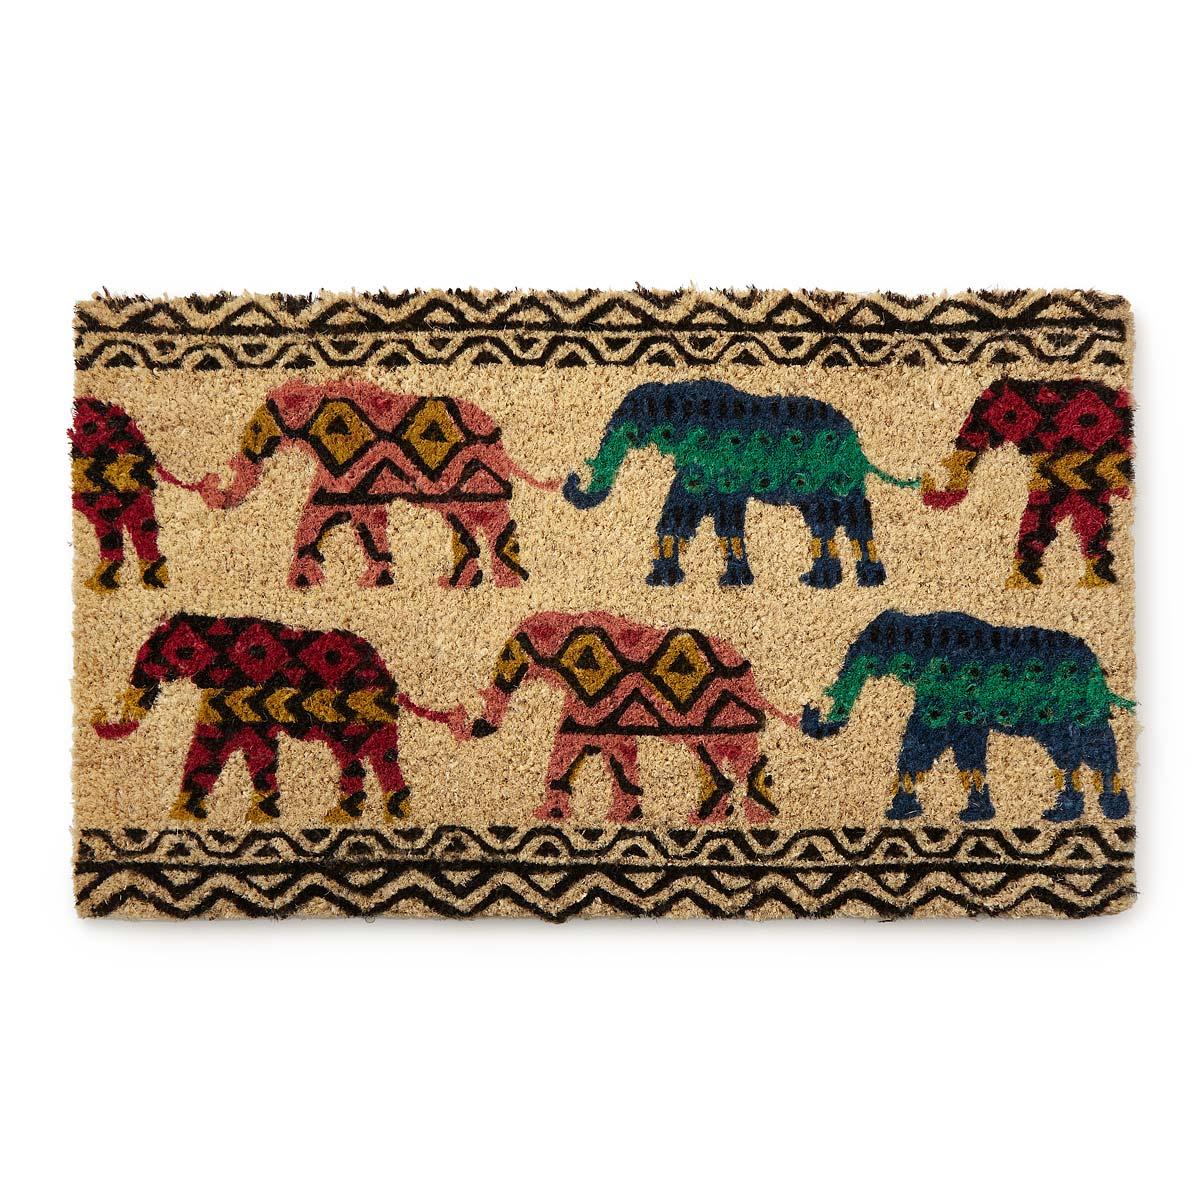 Charmant Global Elephant Doormat 1 Thumbnail